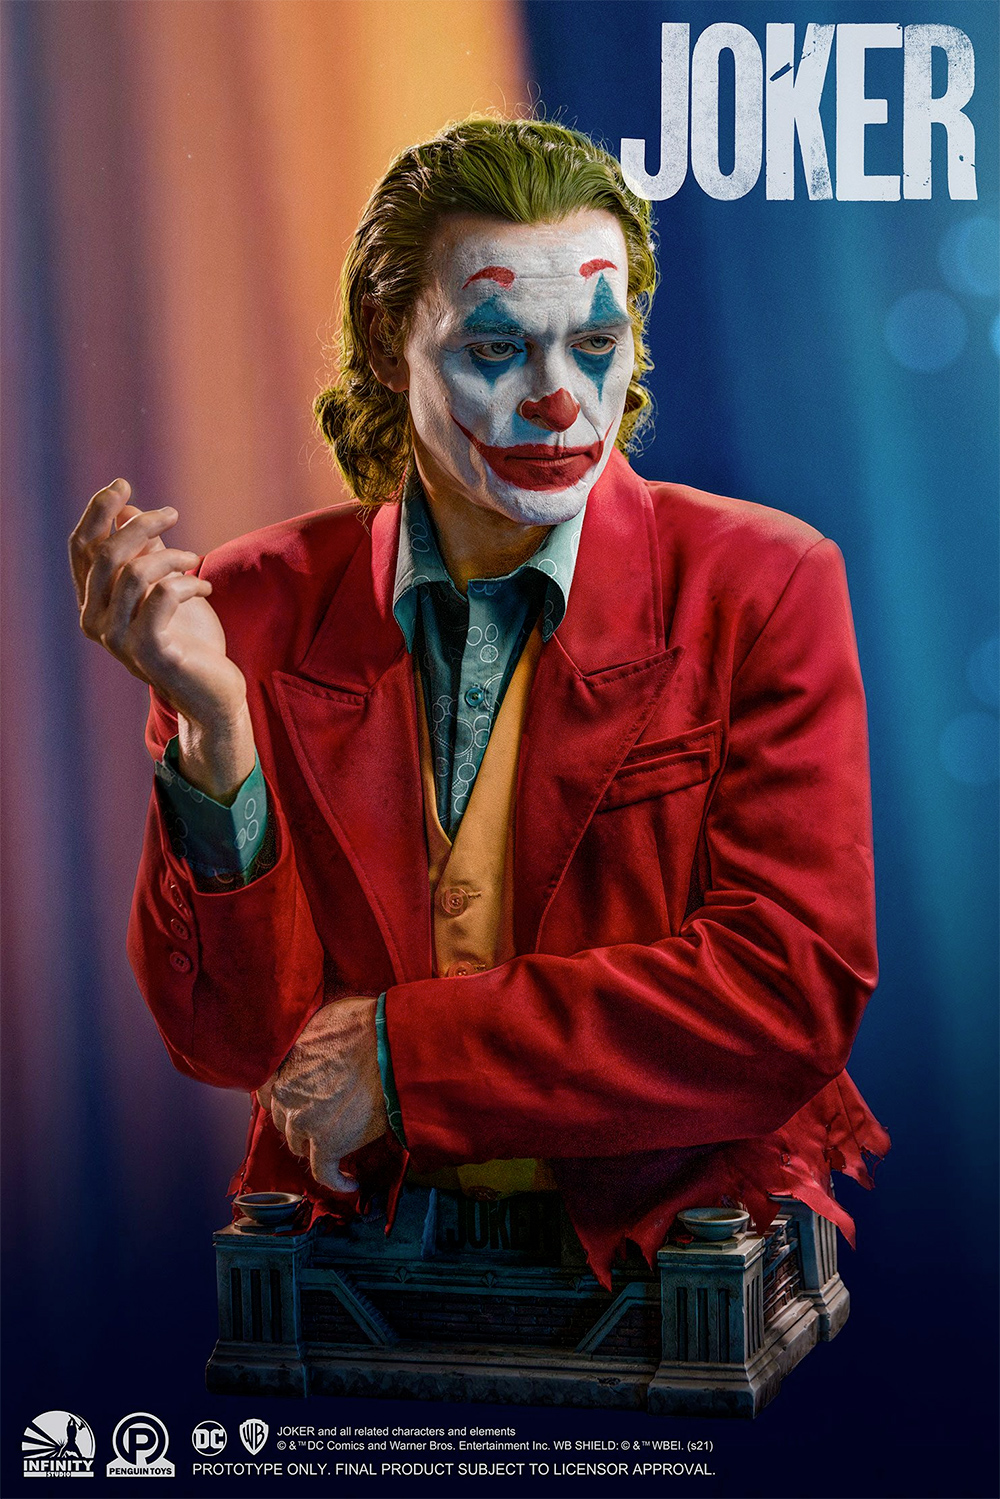 Busto Tamanho Real Coringa Joker Arthur Fleck Life-Size